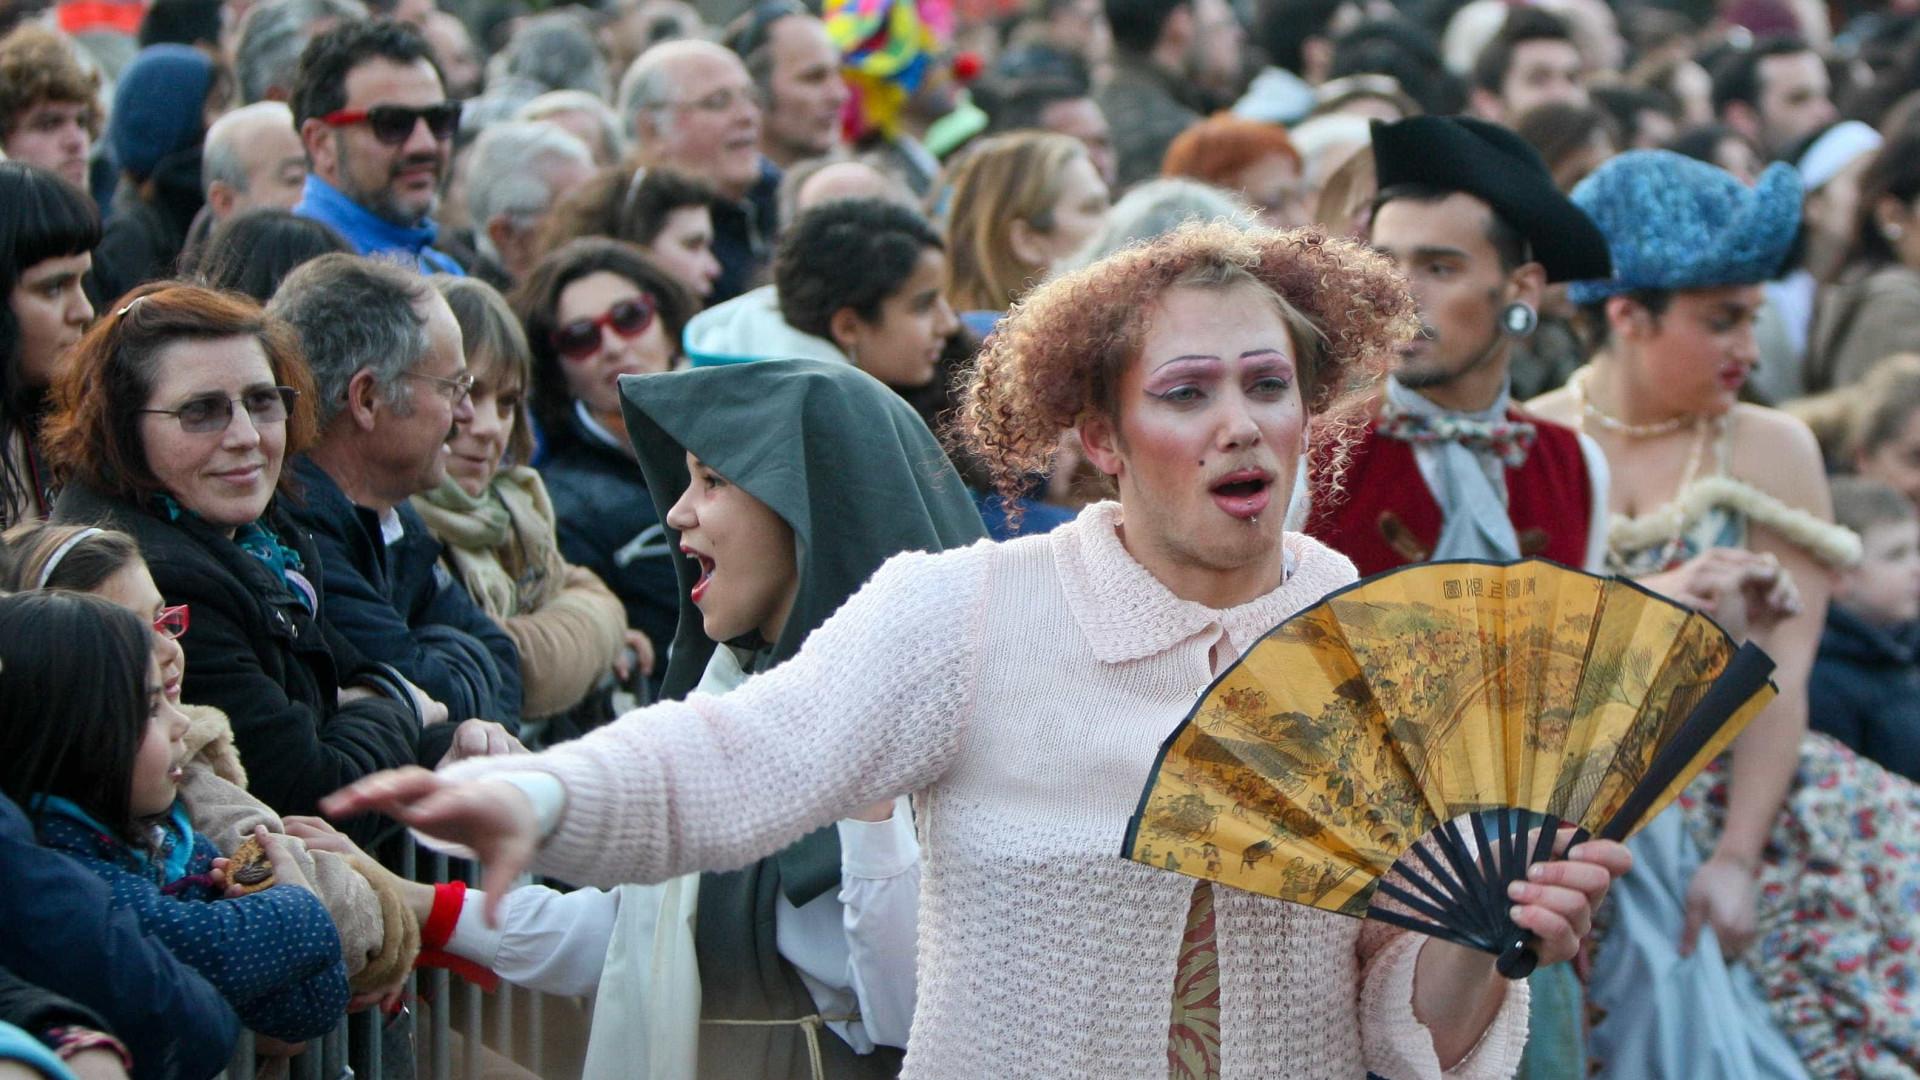 Chapitô participa em festival de artes circenses em França